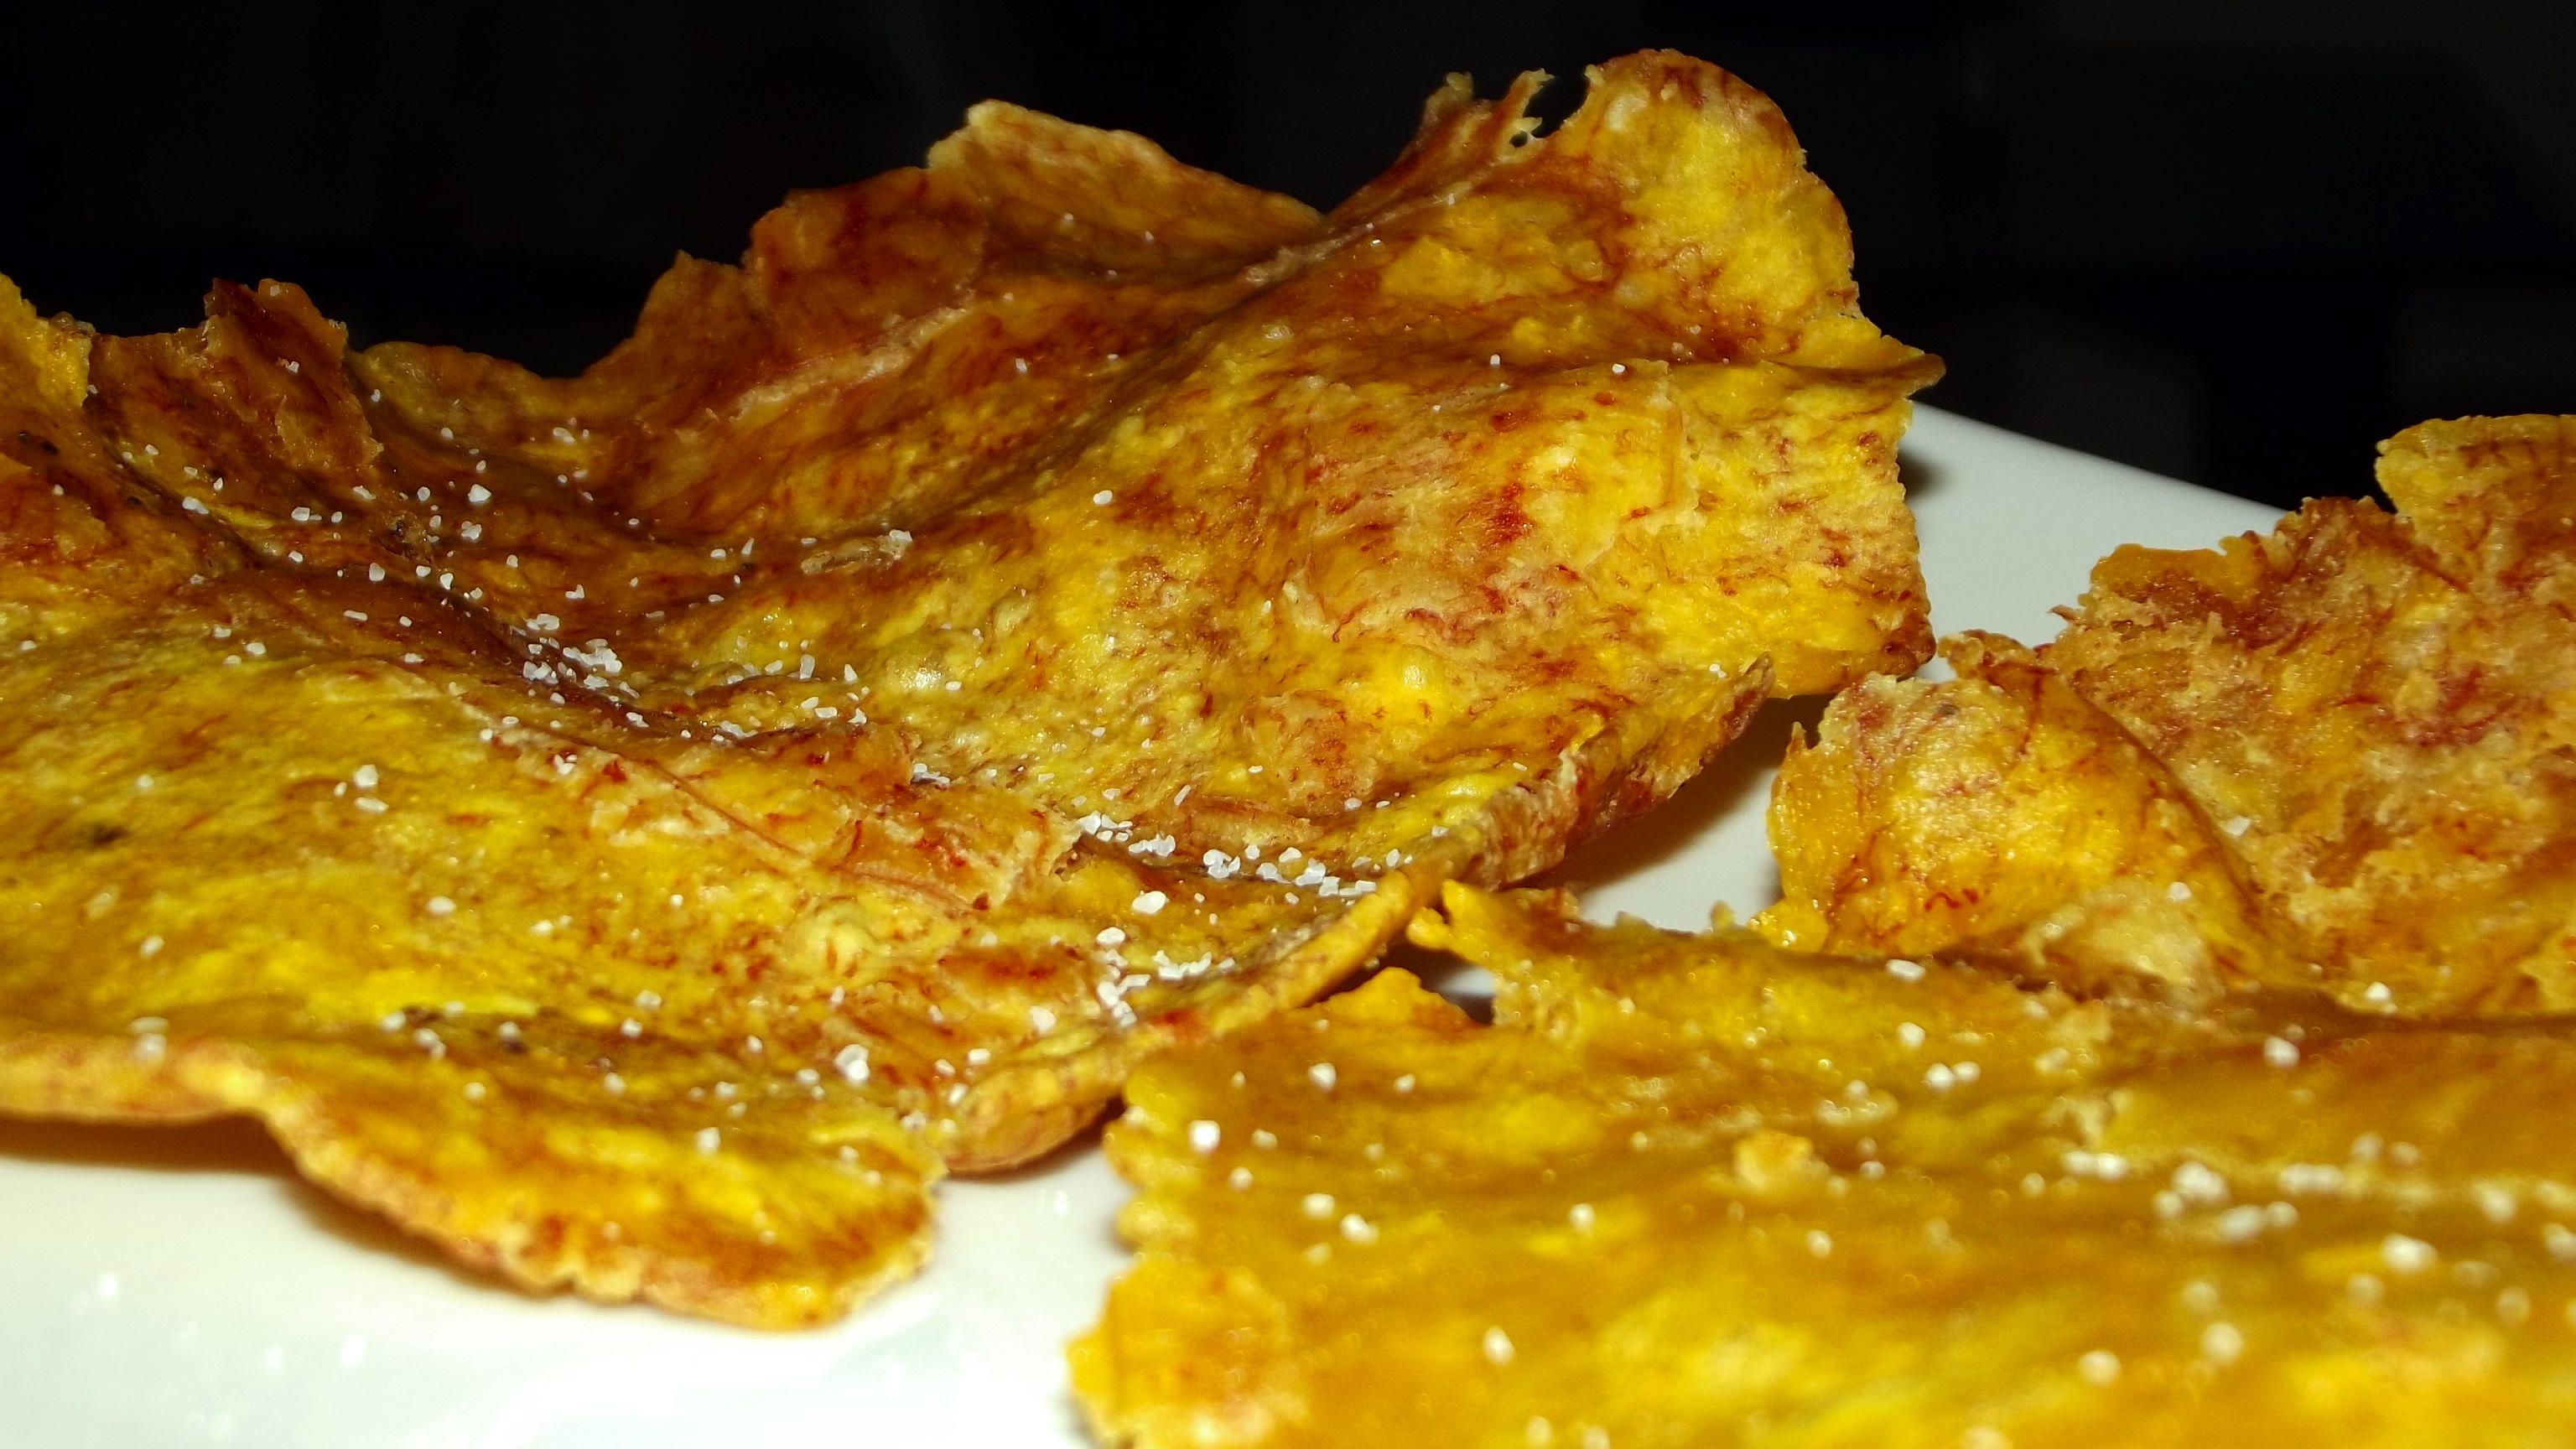 Patacones en Amauz Gourmet. #ExquisitamenteElegante